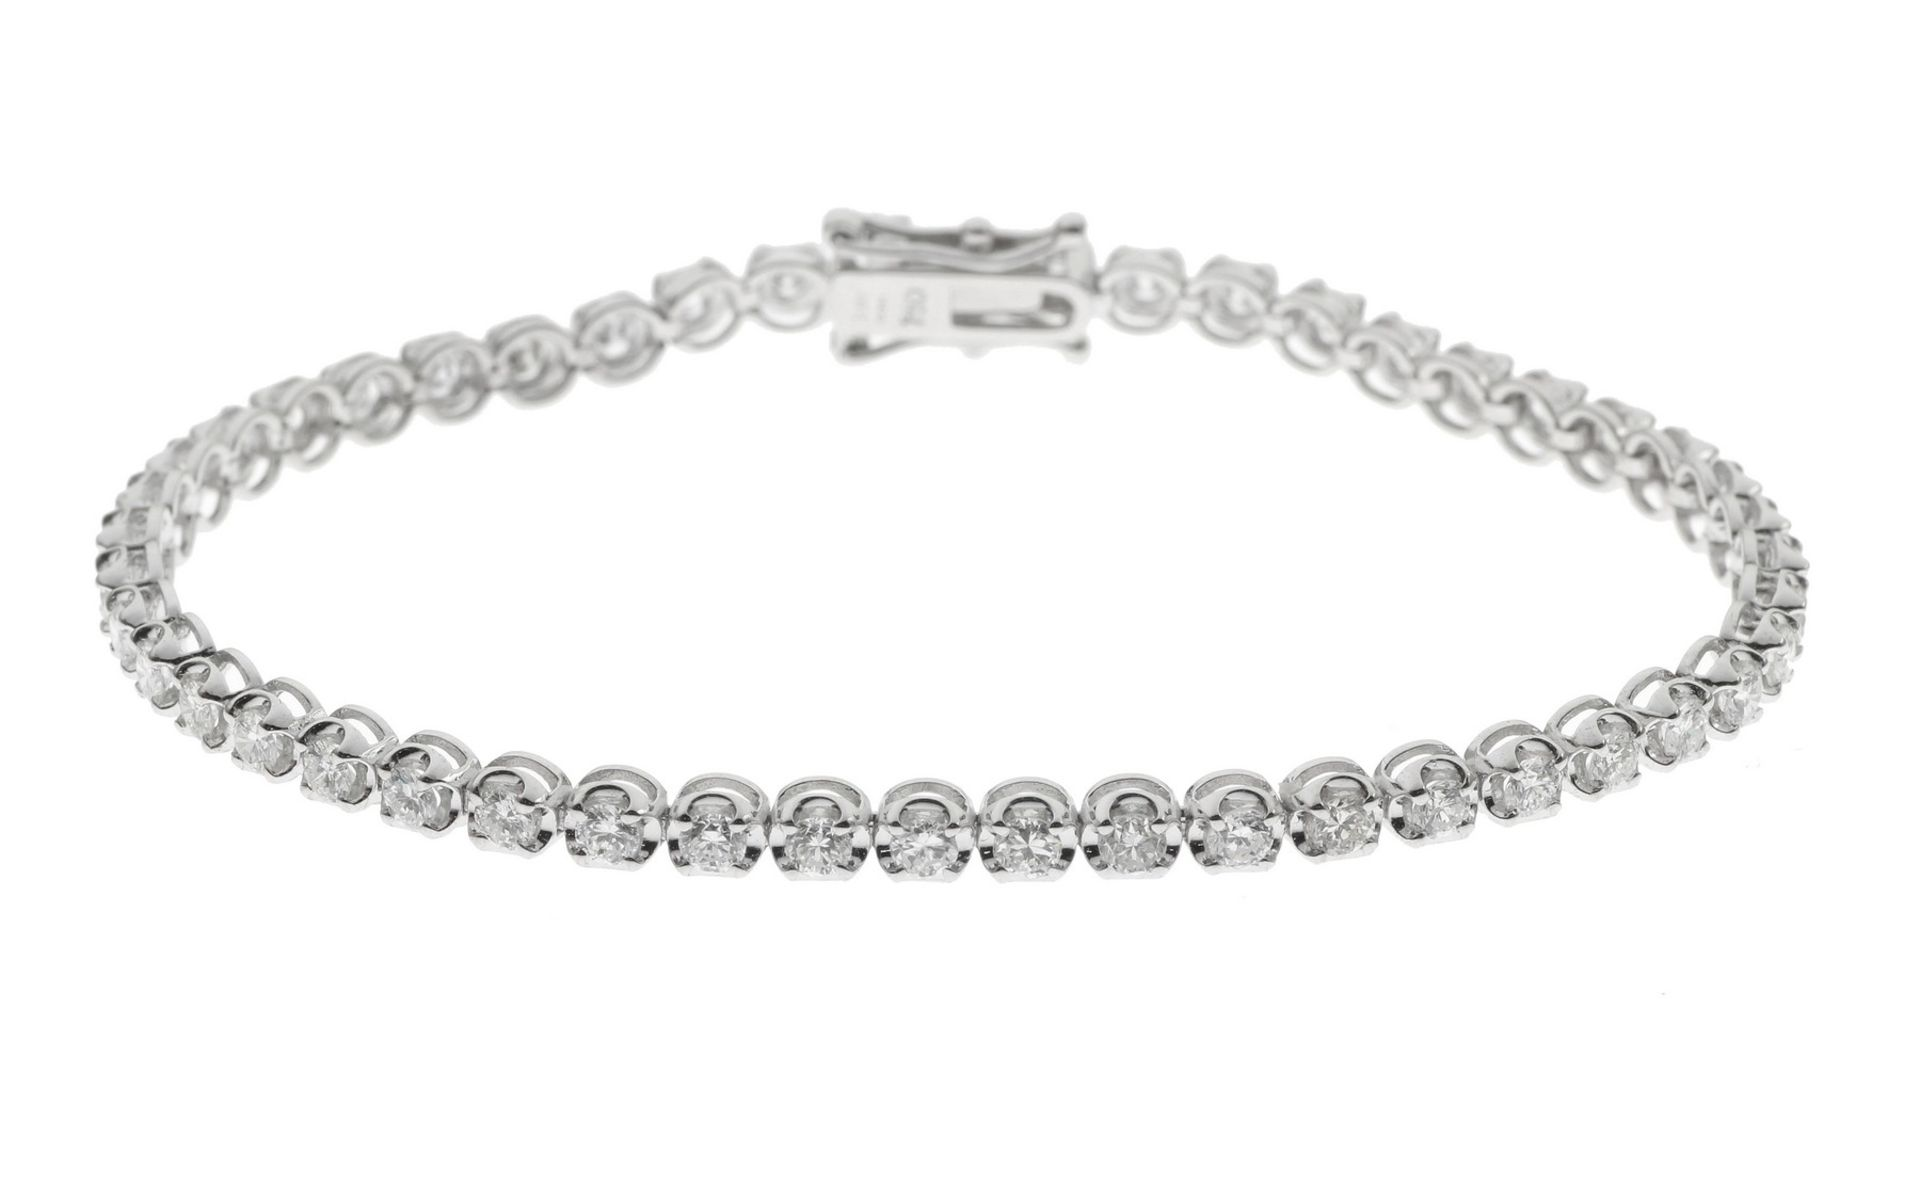 Tennisarmband mit Diamanten - Bild 3 aus 3